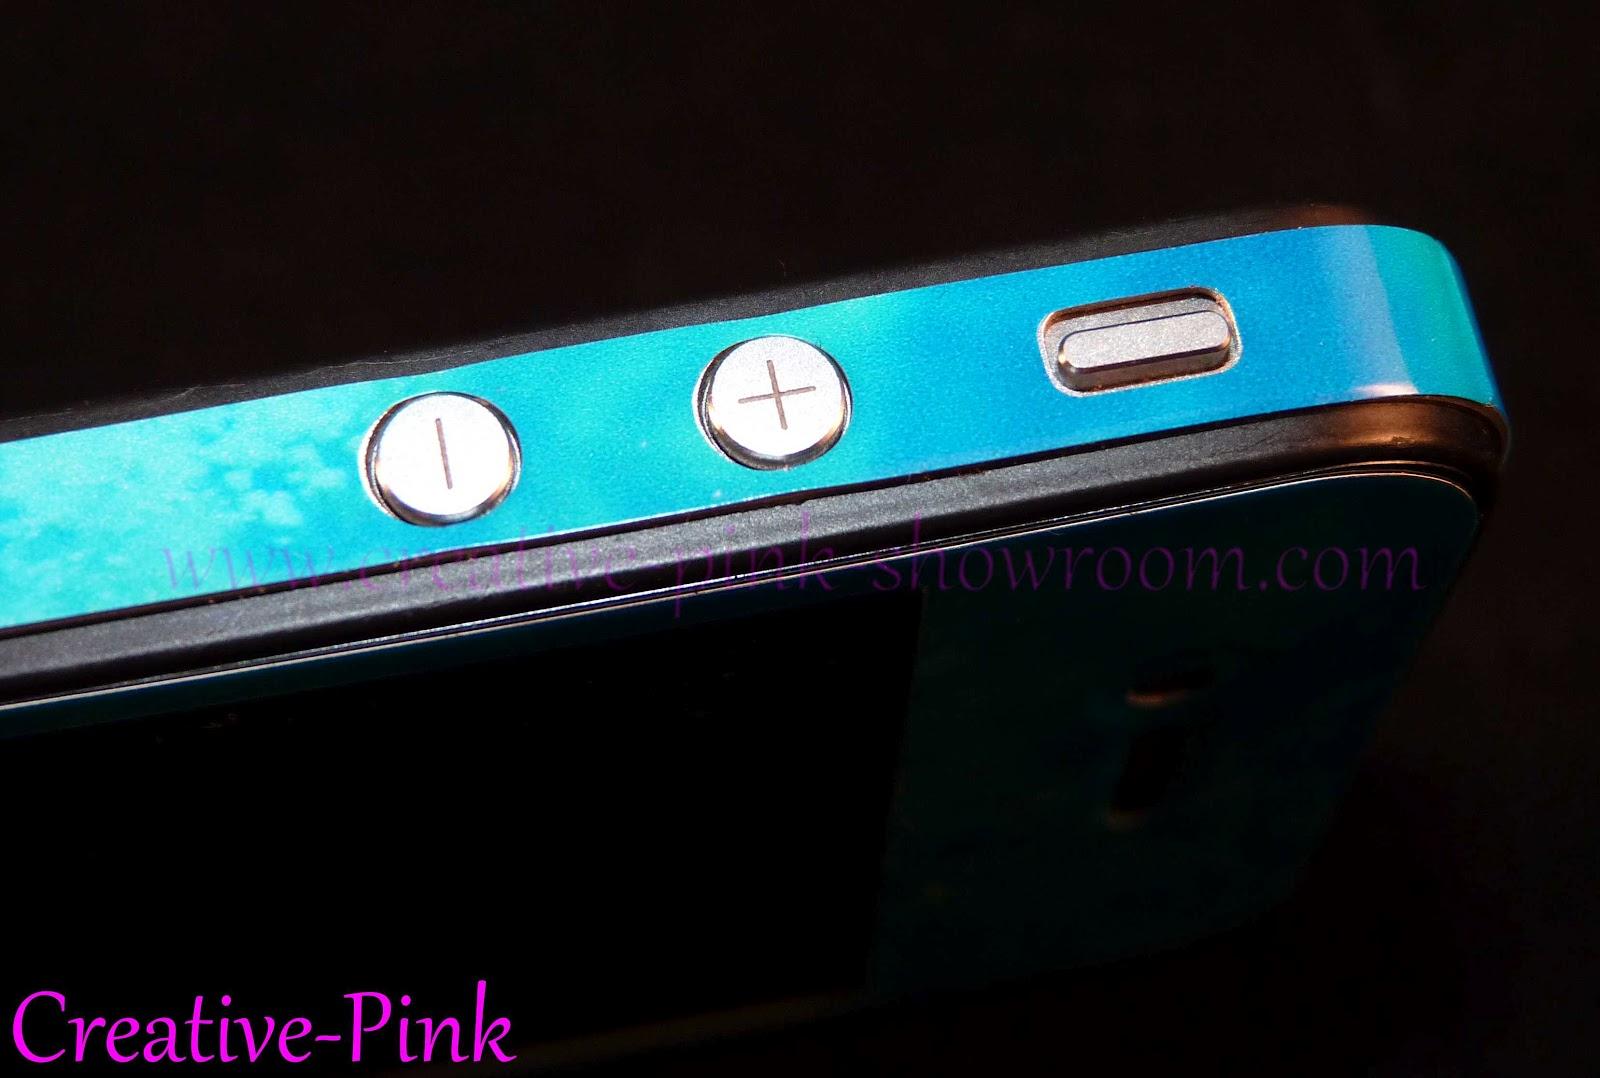 showroom by creative pink mein iphone macht jetzt blau. Black Bedroom Furniture Sets. Home Design Ideas